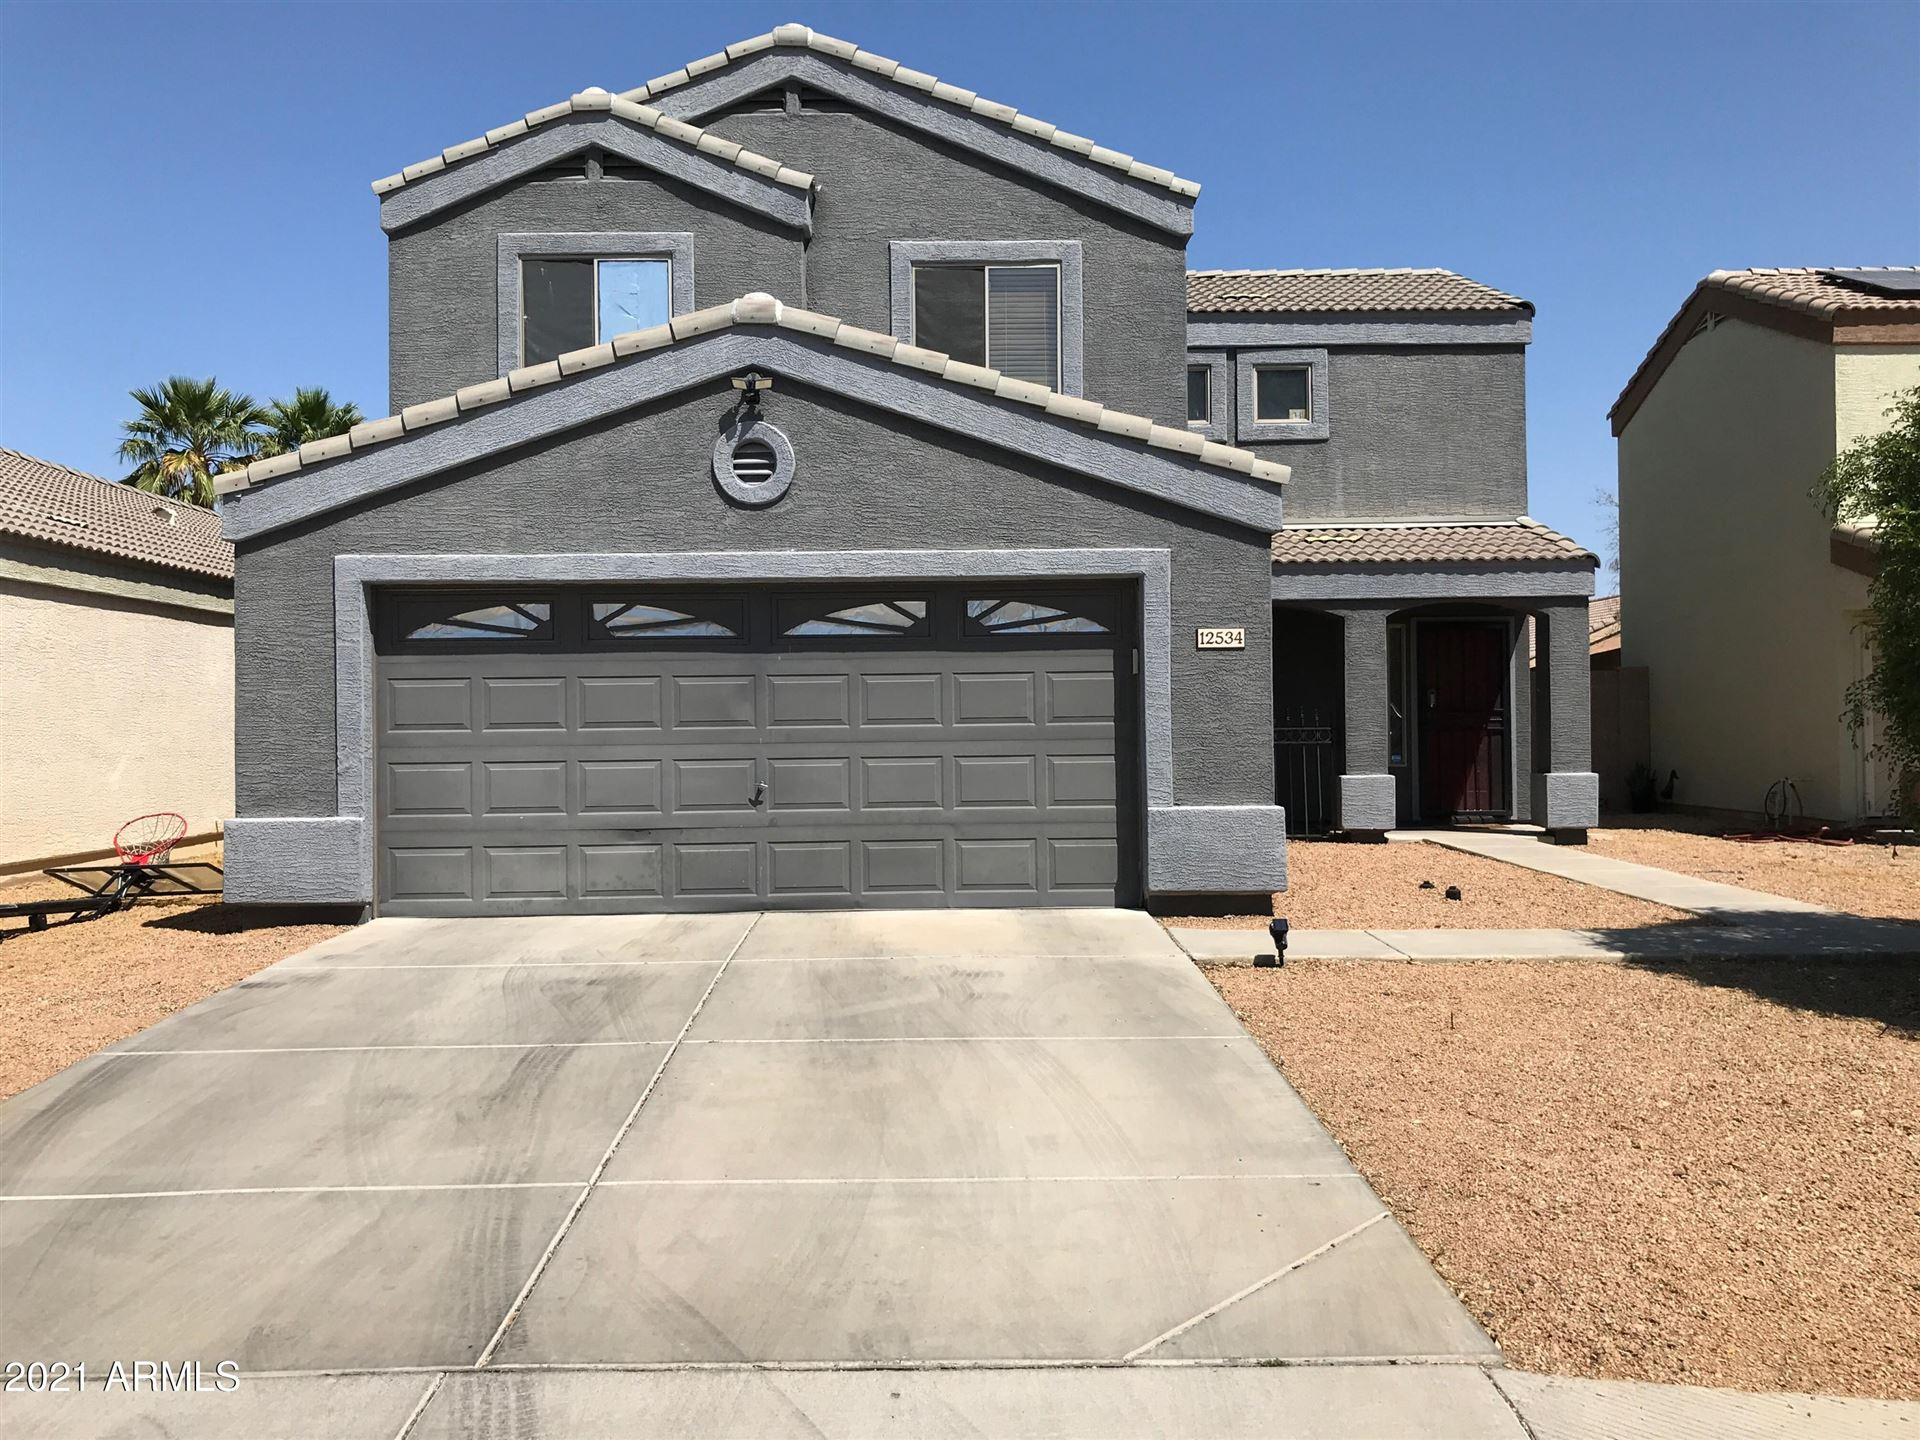 Photo of 12534 W ASH Street, El Mirage, AZ 85335 (MLS # 6229875)